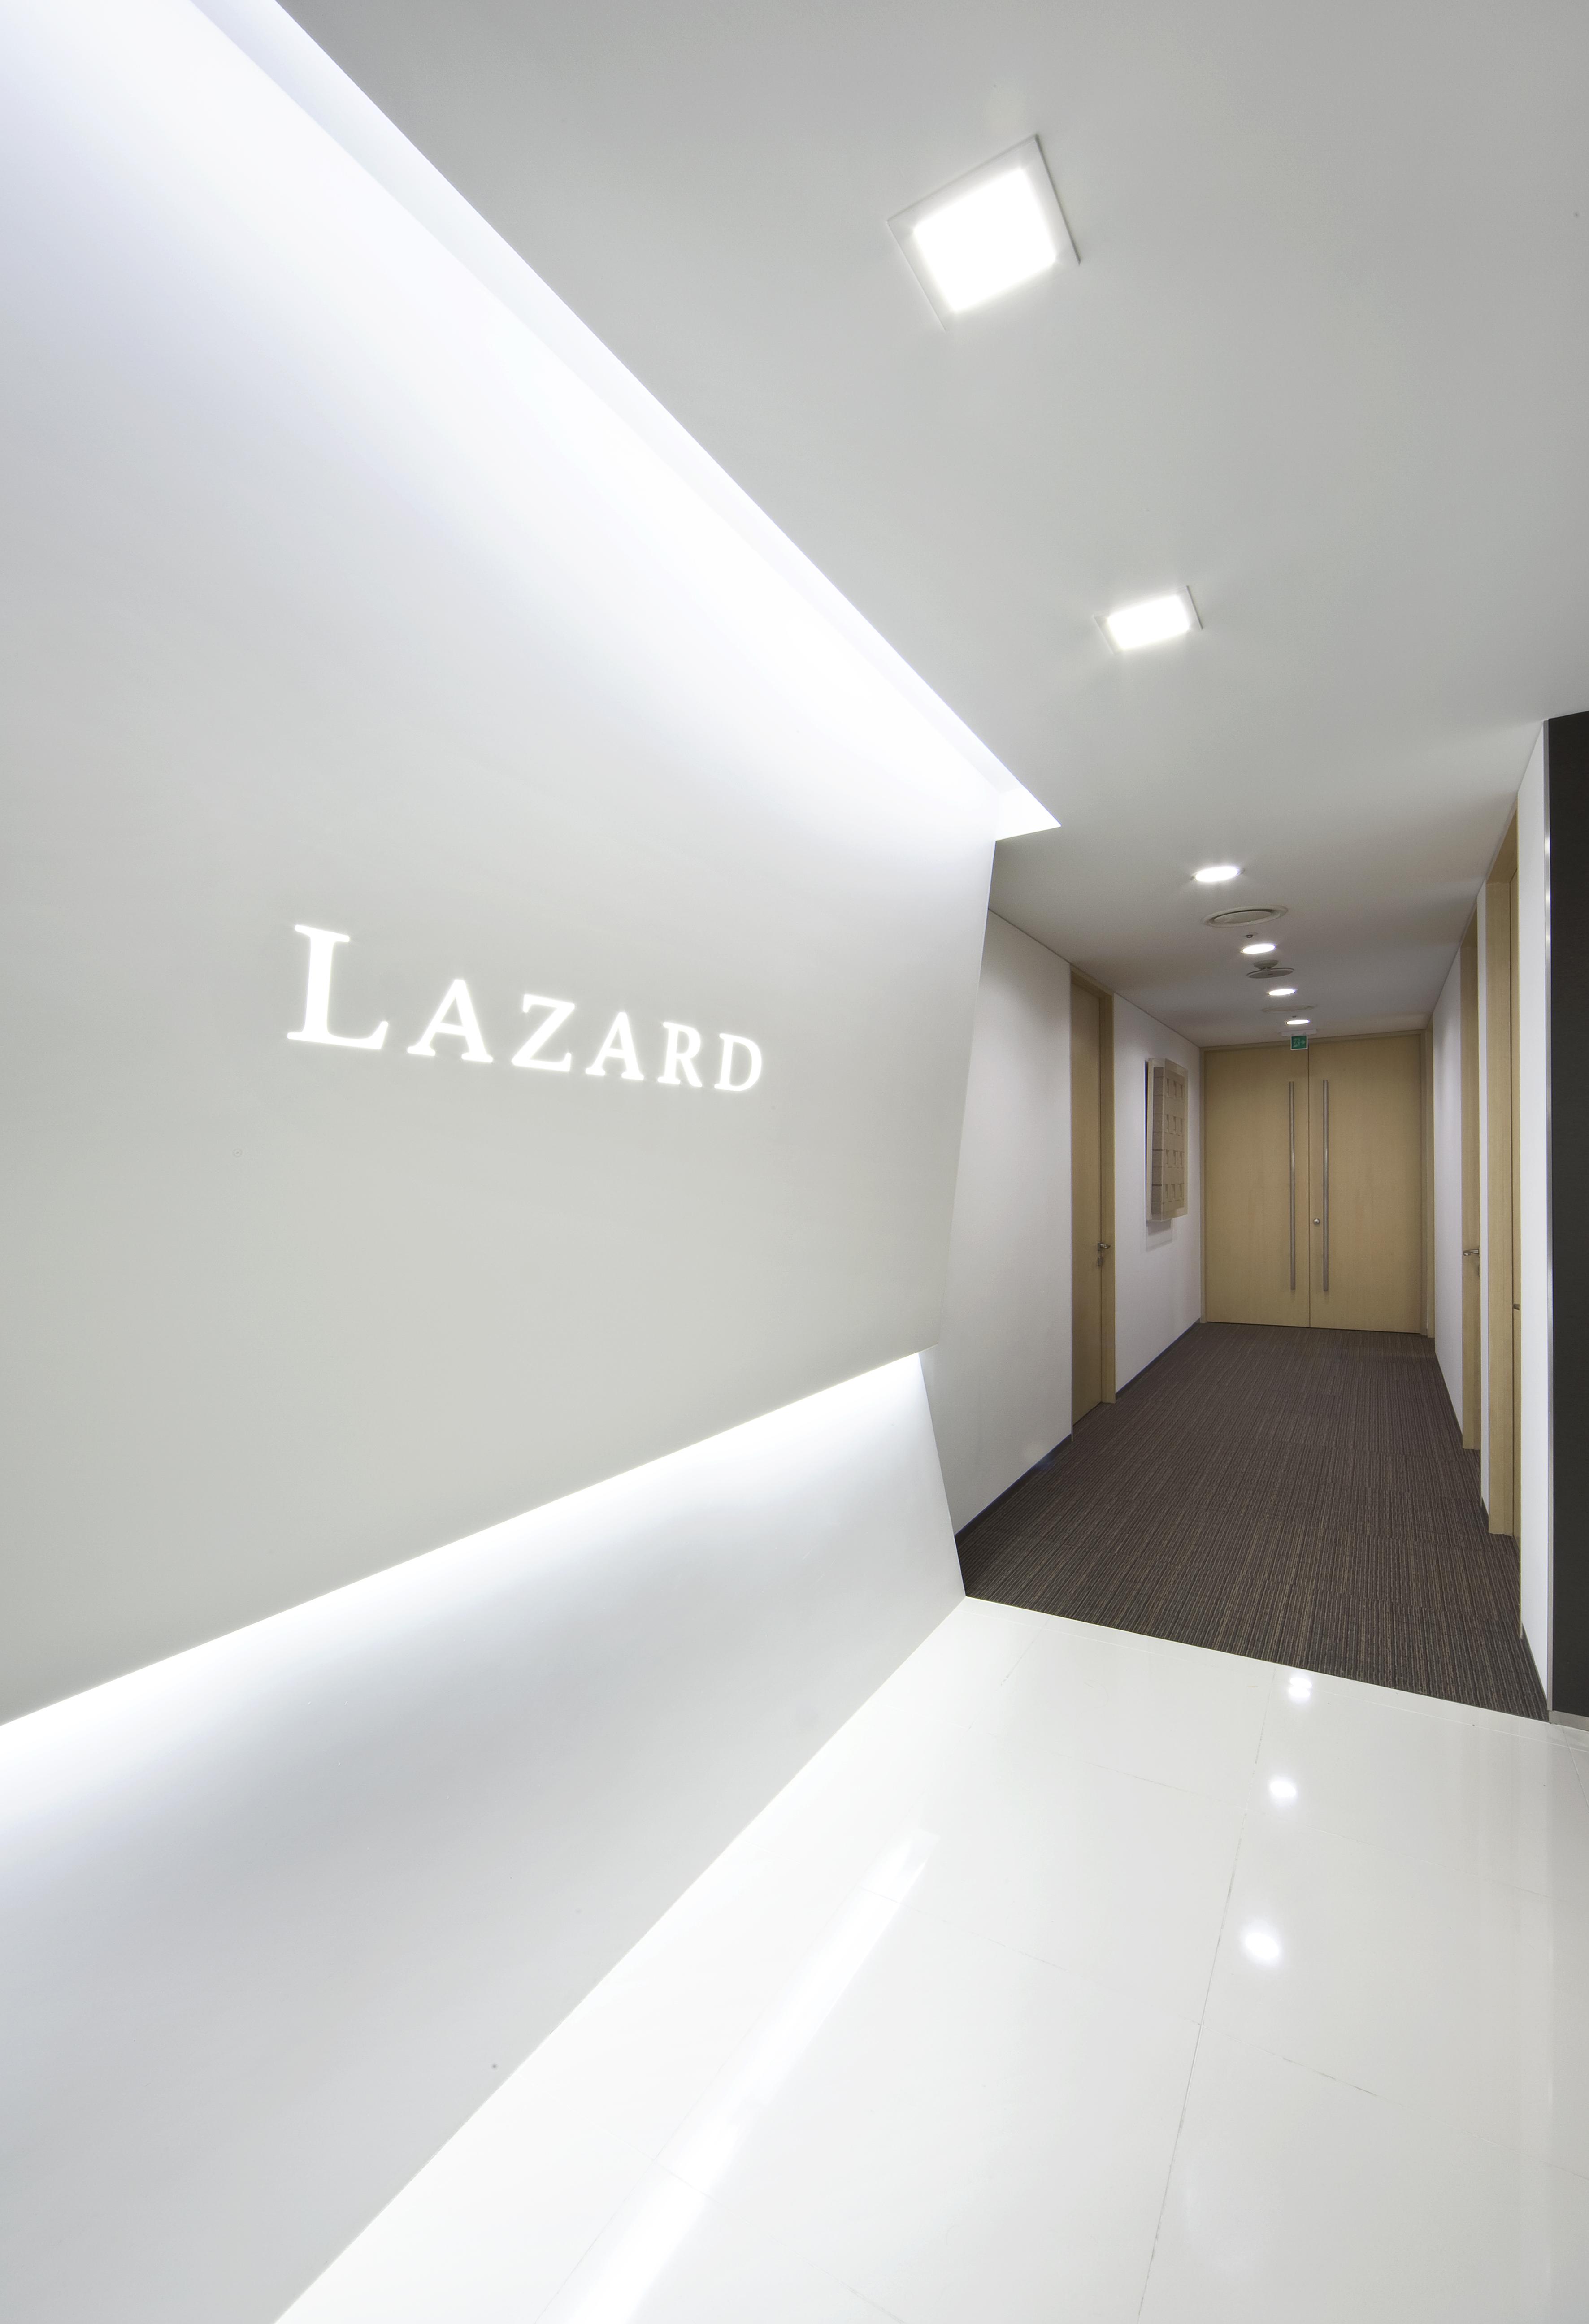 lazard loby2